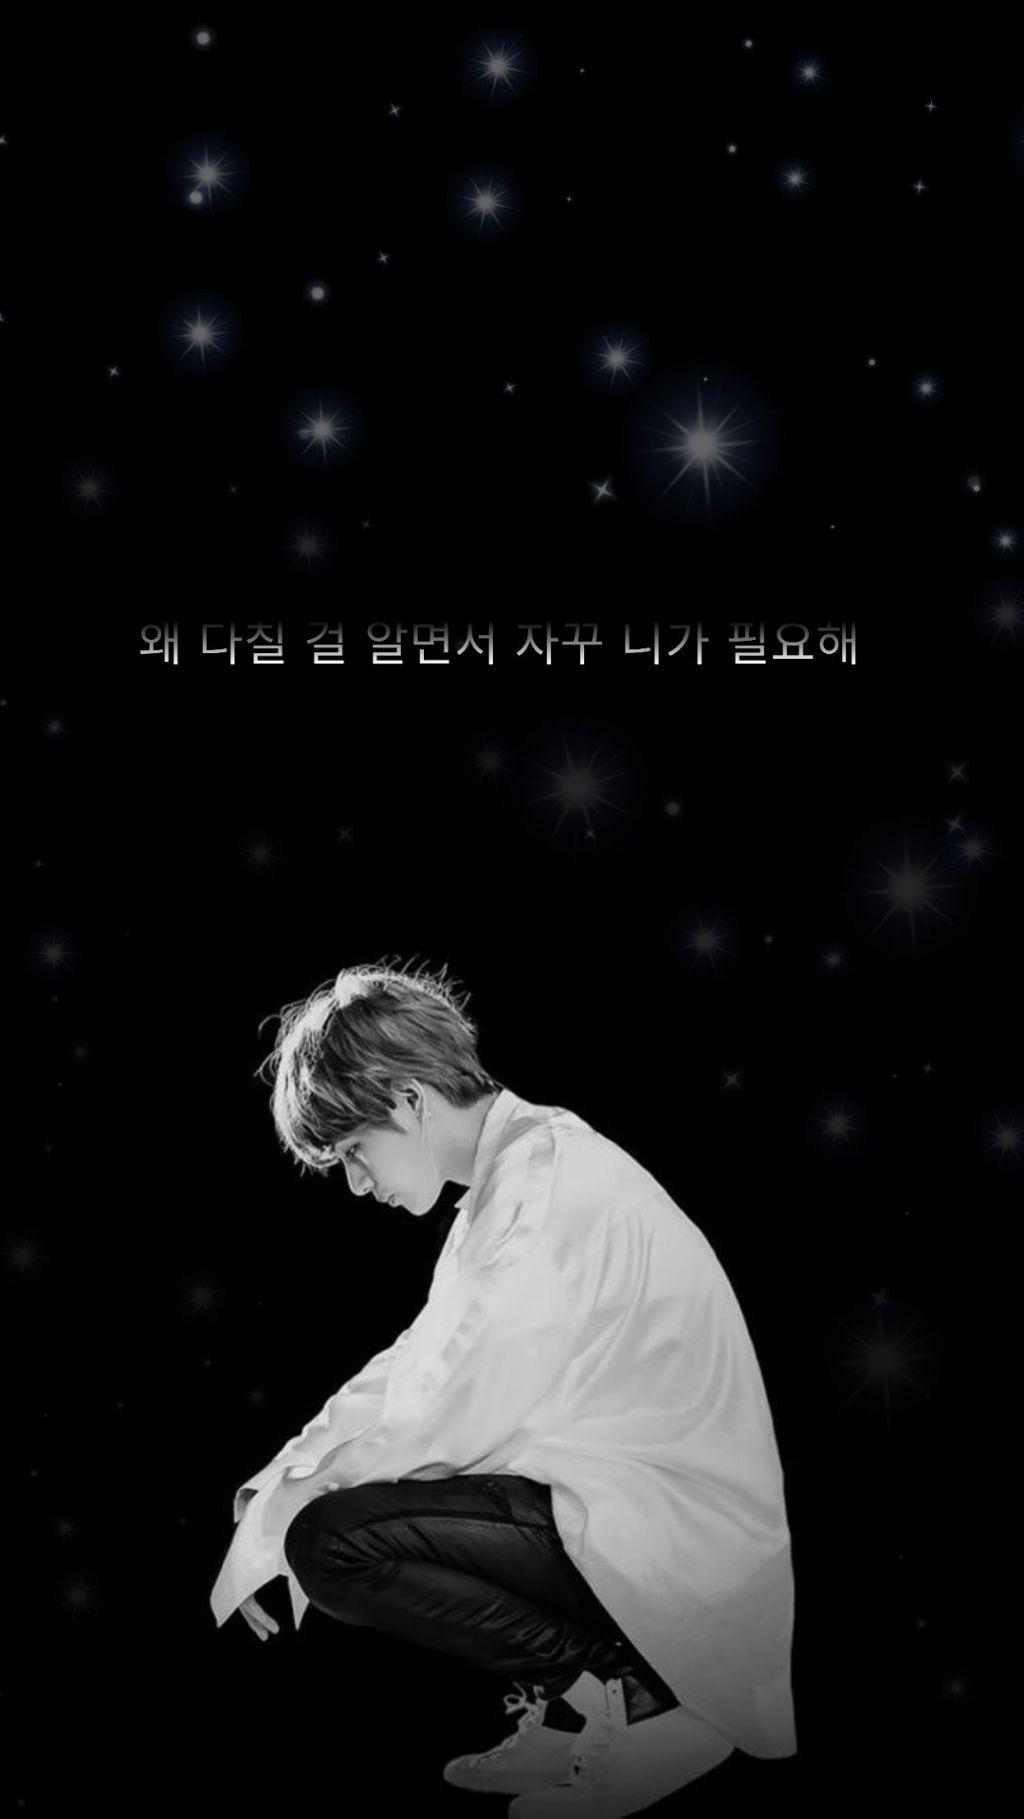 taehyung bts wallpaper kpop korea Image by V